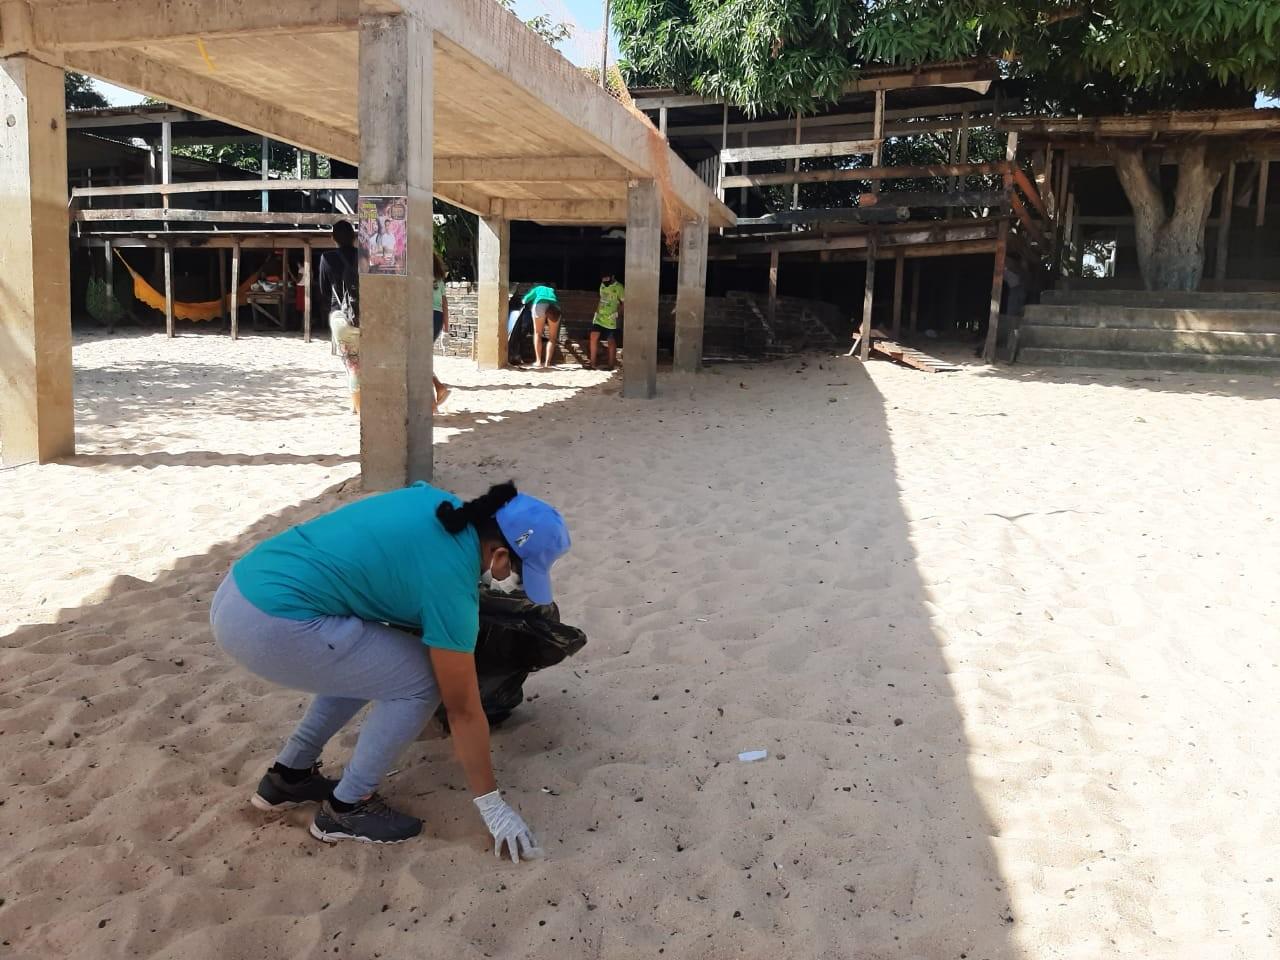 Projeto 'Tapajós limpo, praia limpa' realiza ação ambiental na praia do Maracanã, em Santarém